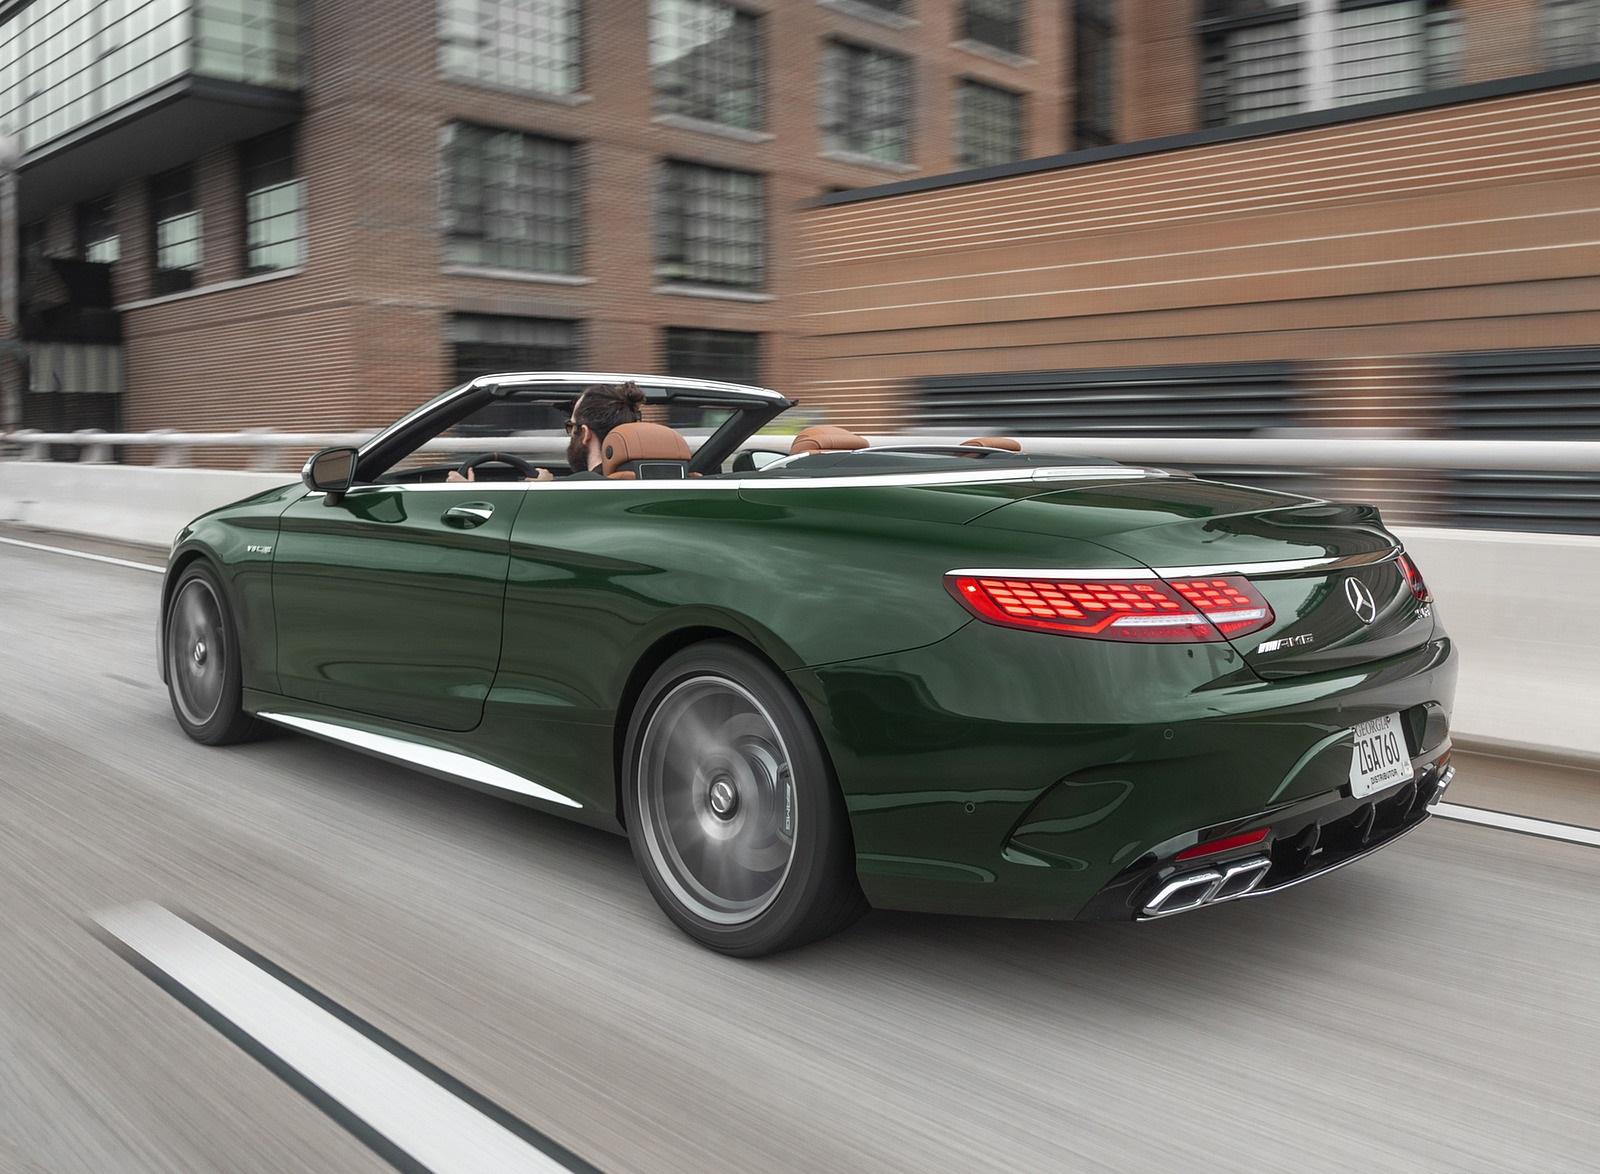 2020 Mercedes-AMG S 63 Cabriolet (US-Spec) Rear Three-Quarter Wallpapers (9)